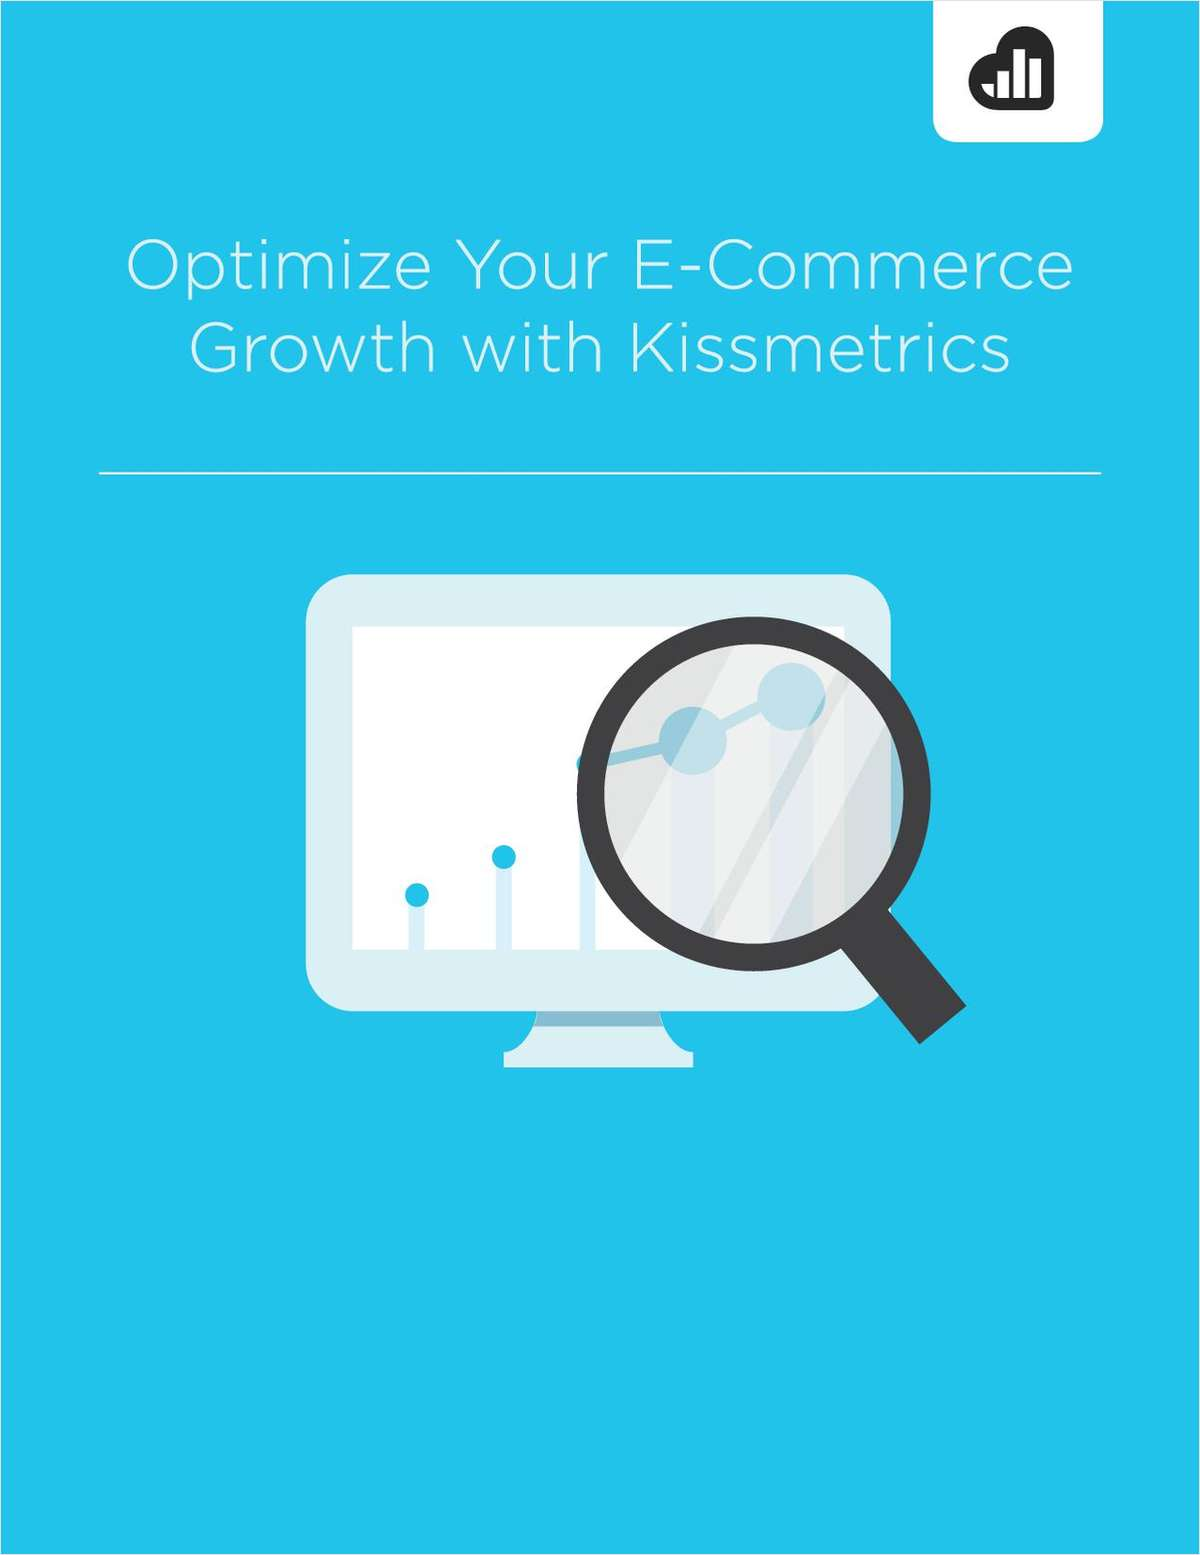 Optimize Your E-Commerce Growth with Kissmetrics